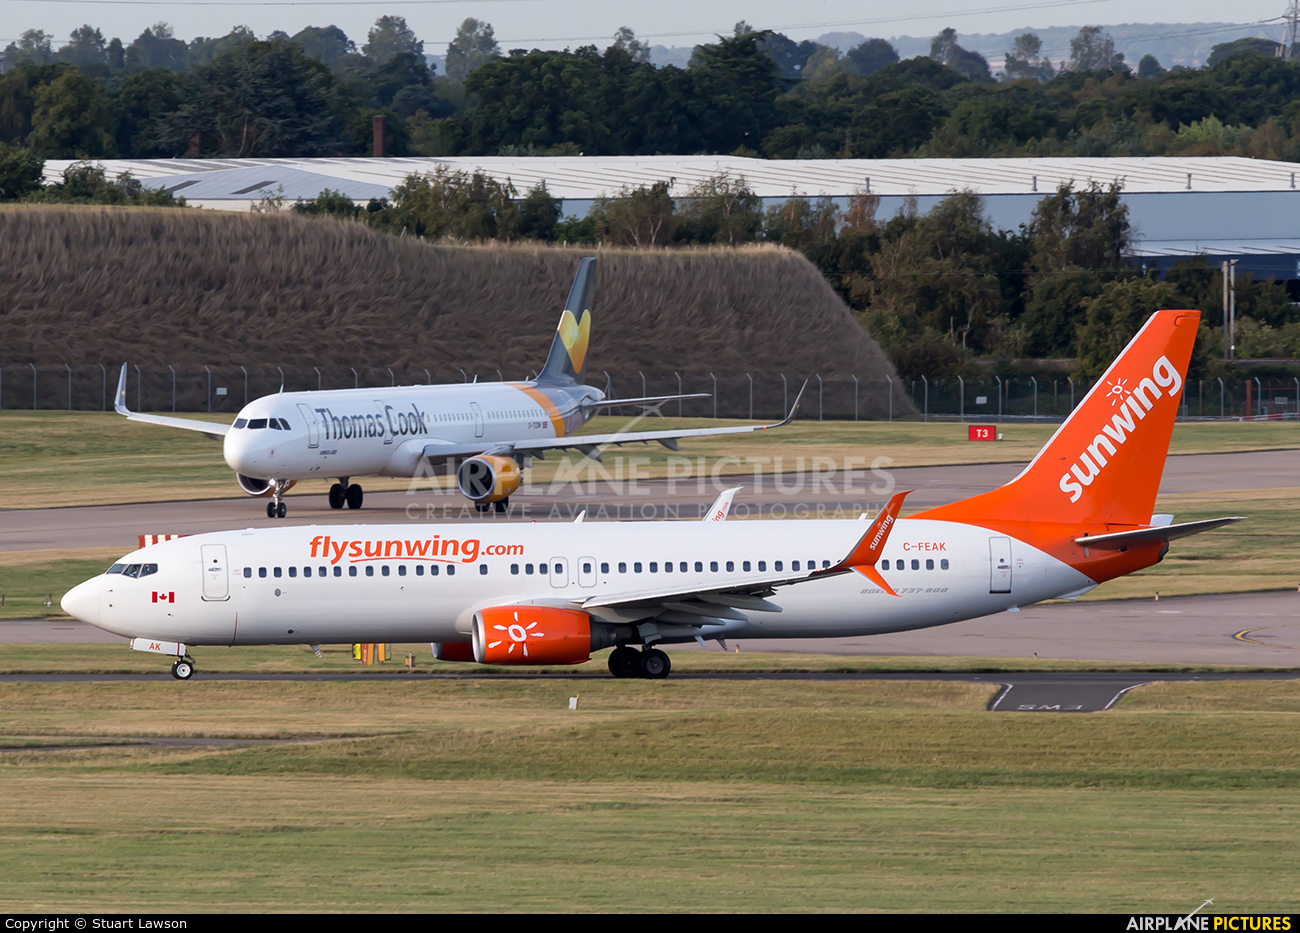 Sunwing Airlines C-FEAK aircraft at Birmingham